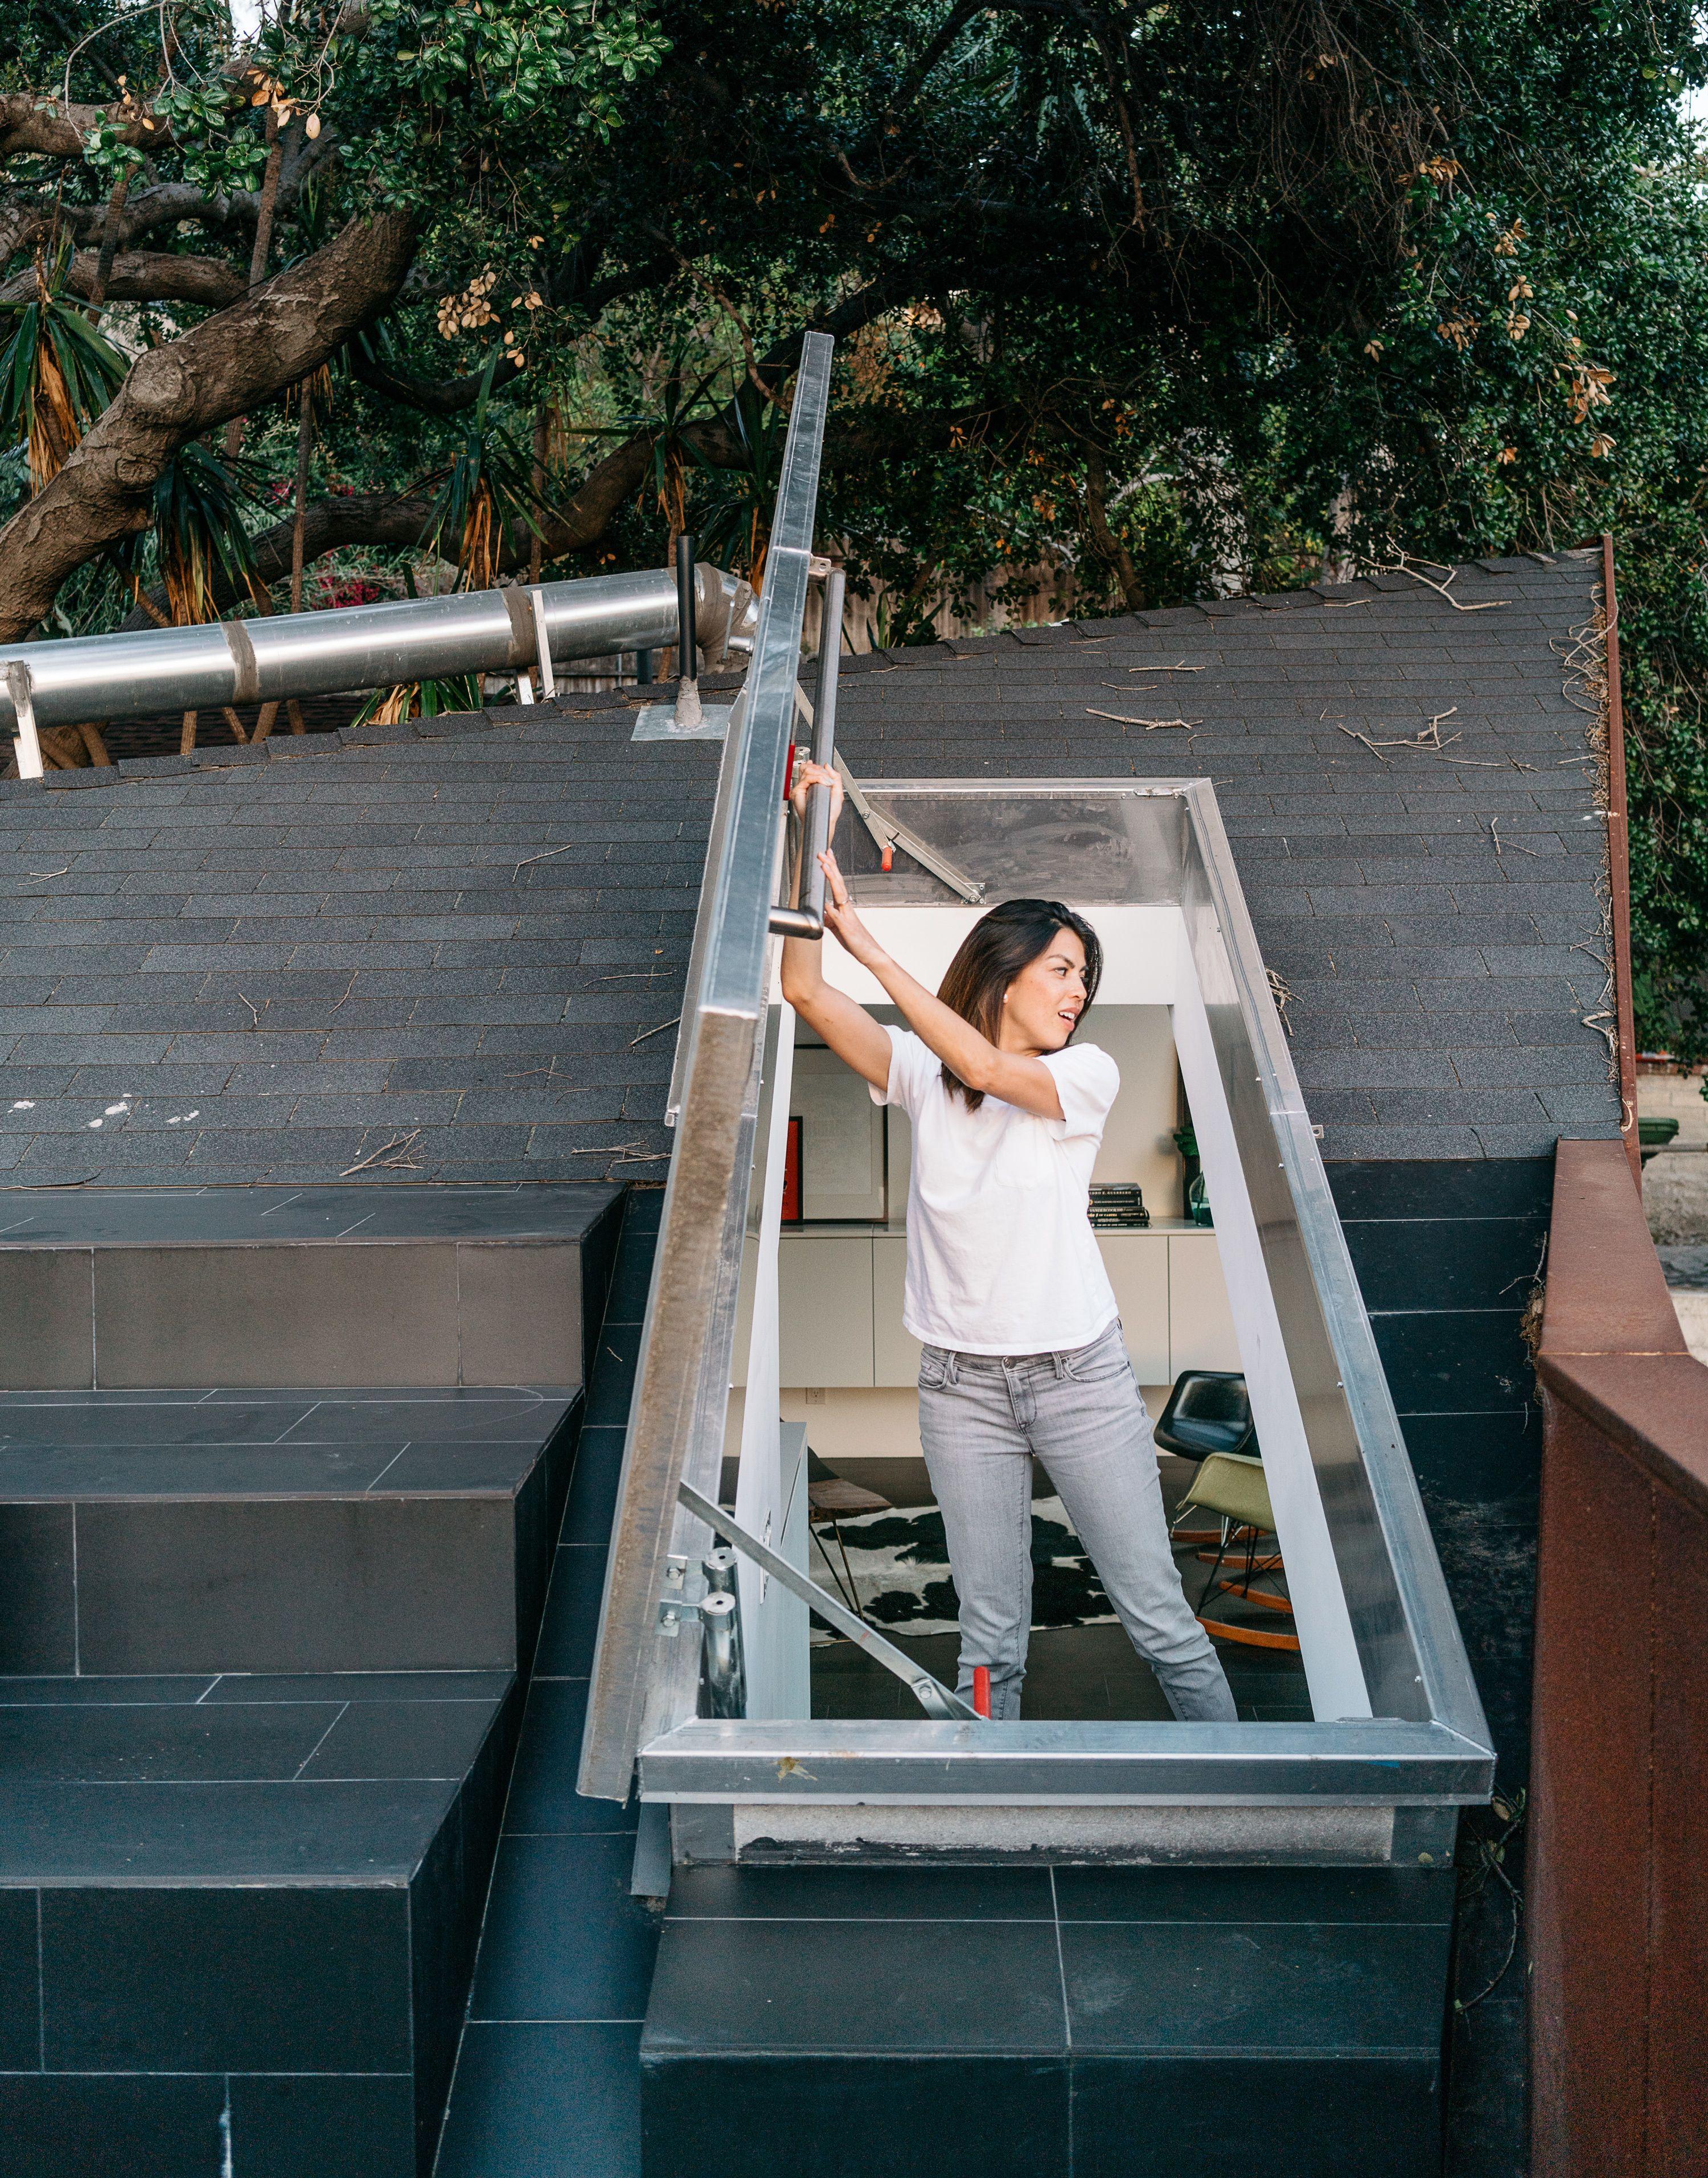 Photo 8 Of 10 In This Los Angeles Home Is Driven By Automotive Design Ide Halaman Belakang Halaman Belakang Kolam